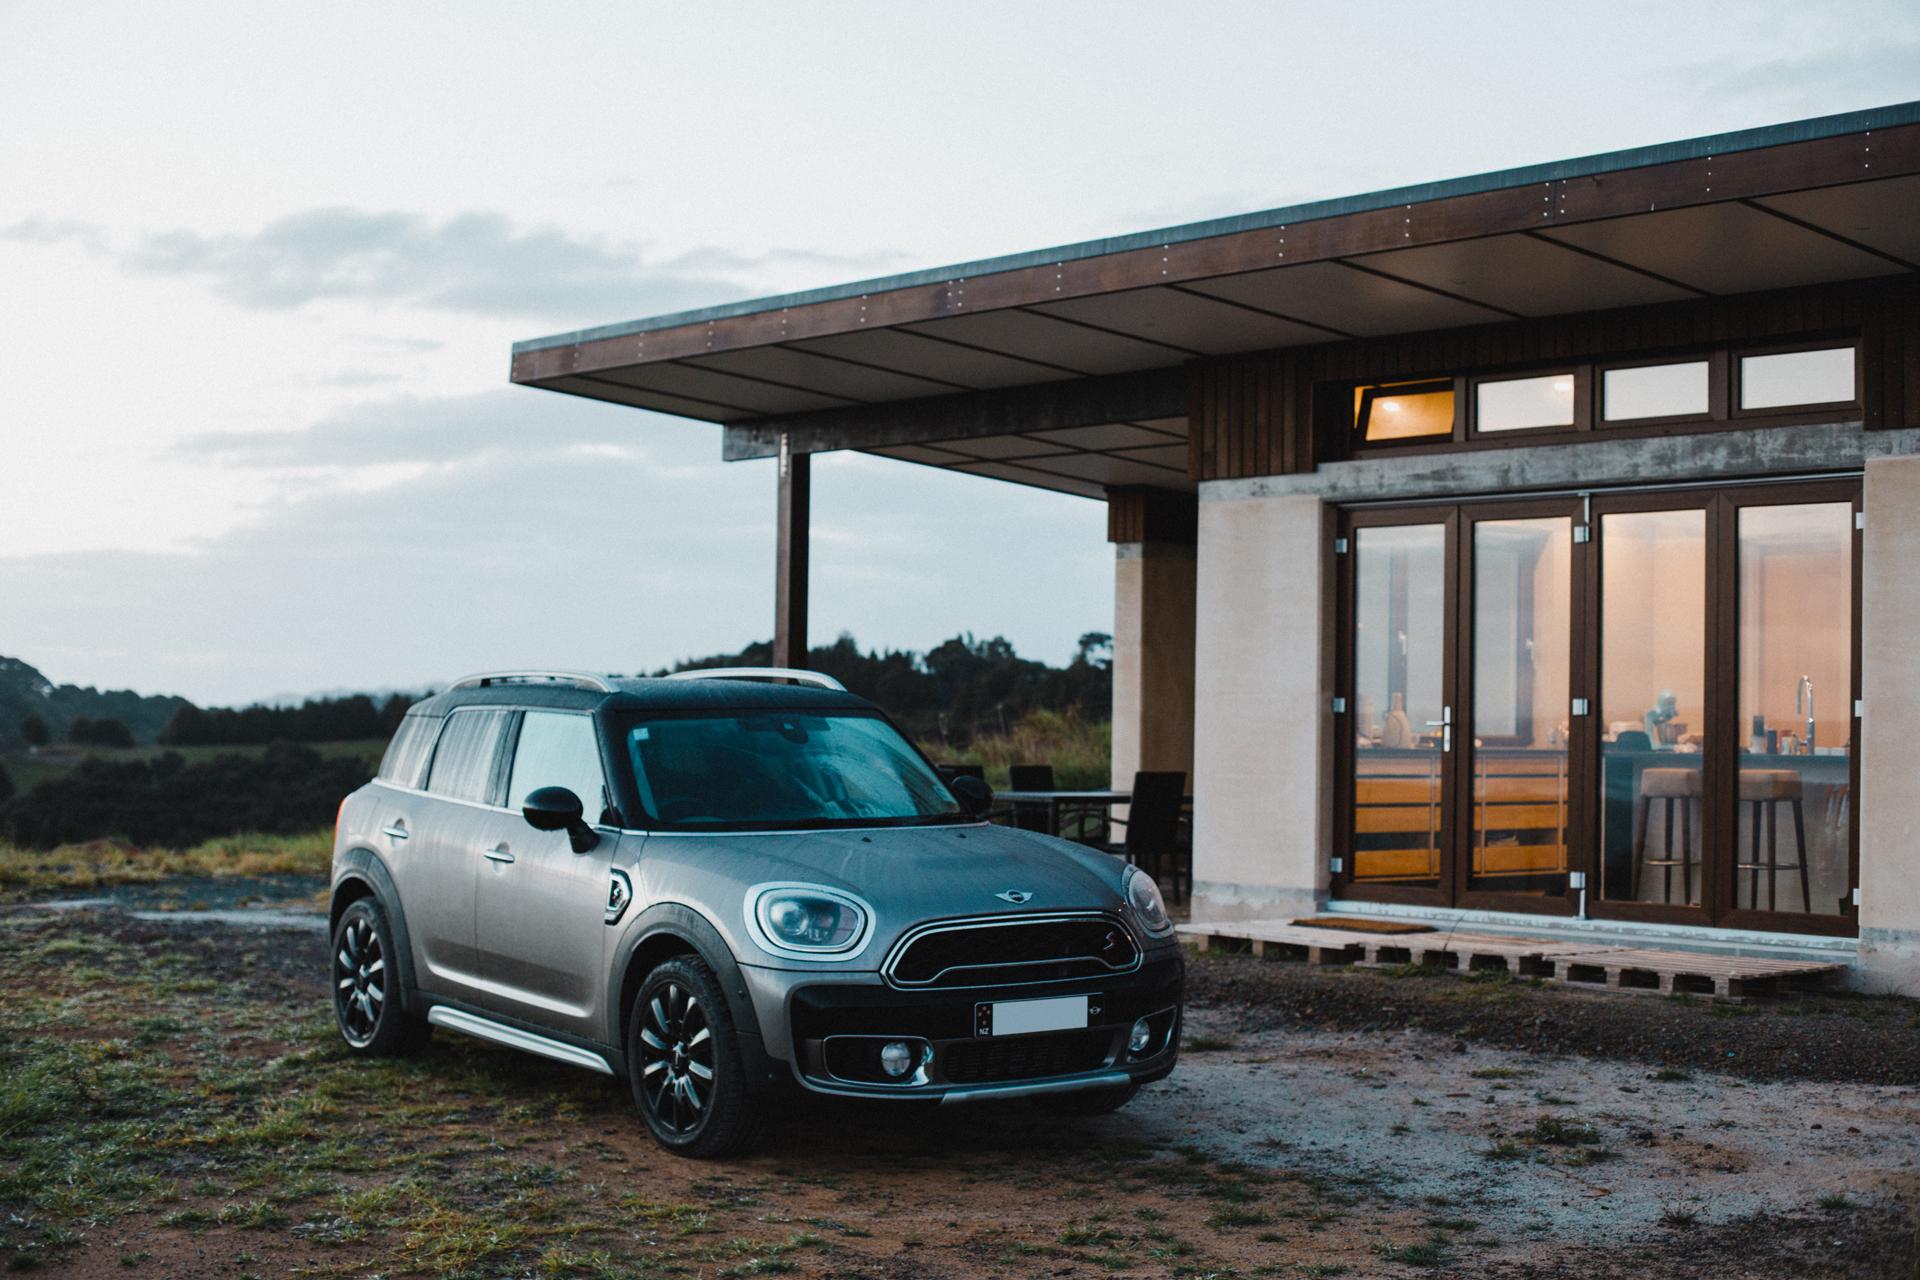 Mini-Countryman_Automotive_Photography_Video_New-Zealand_11_web.jpg